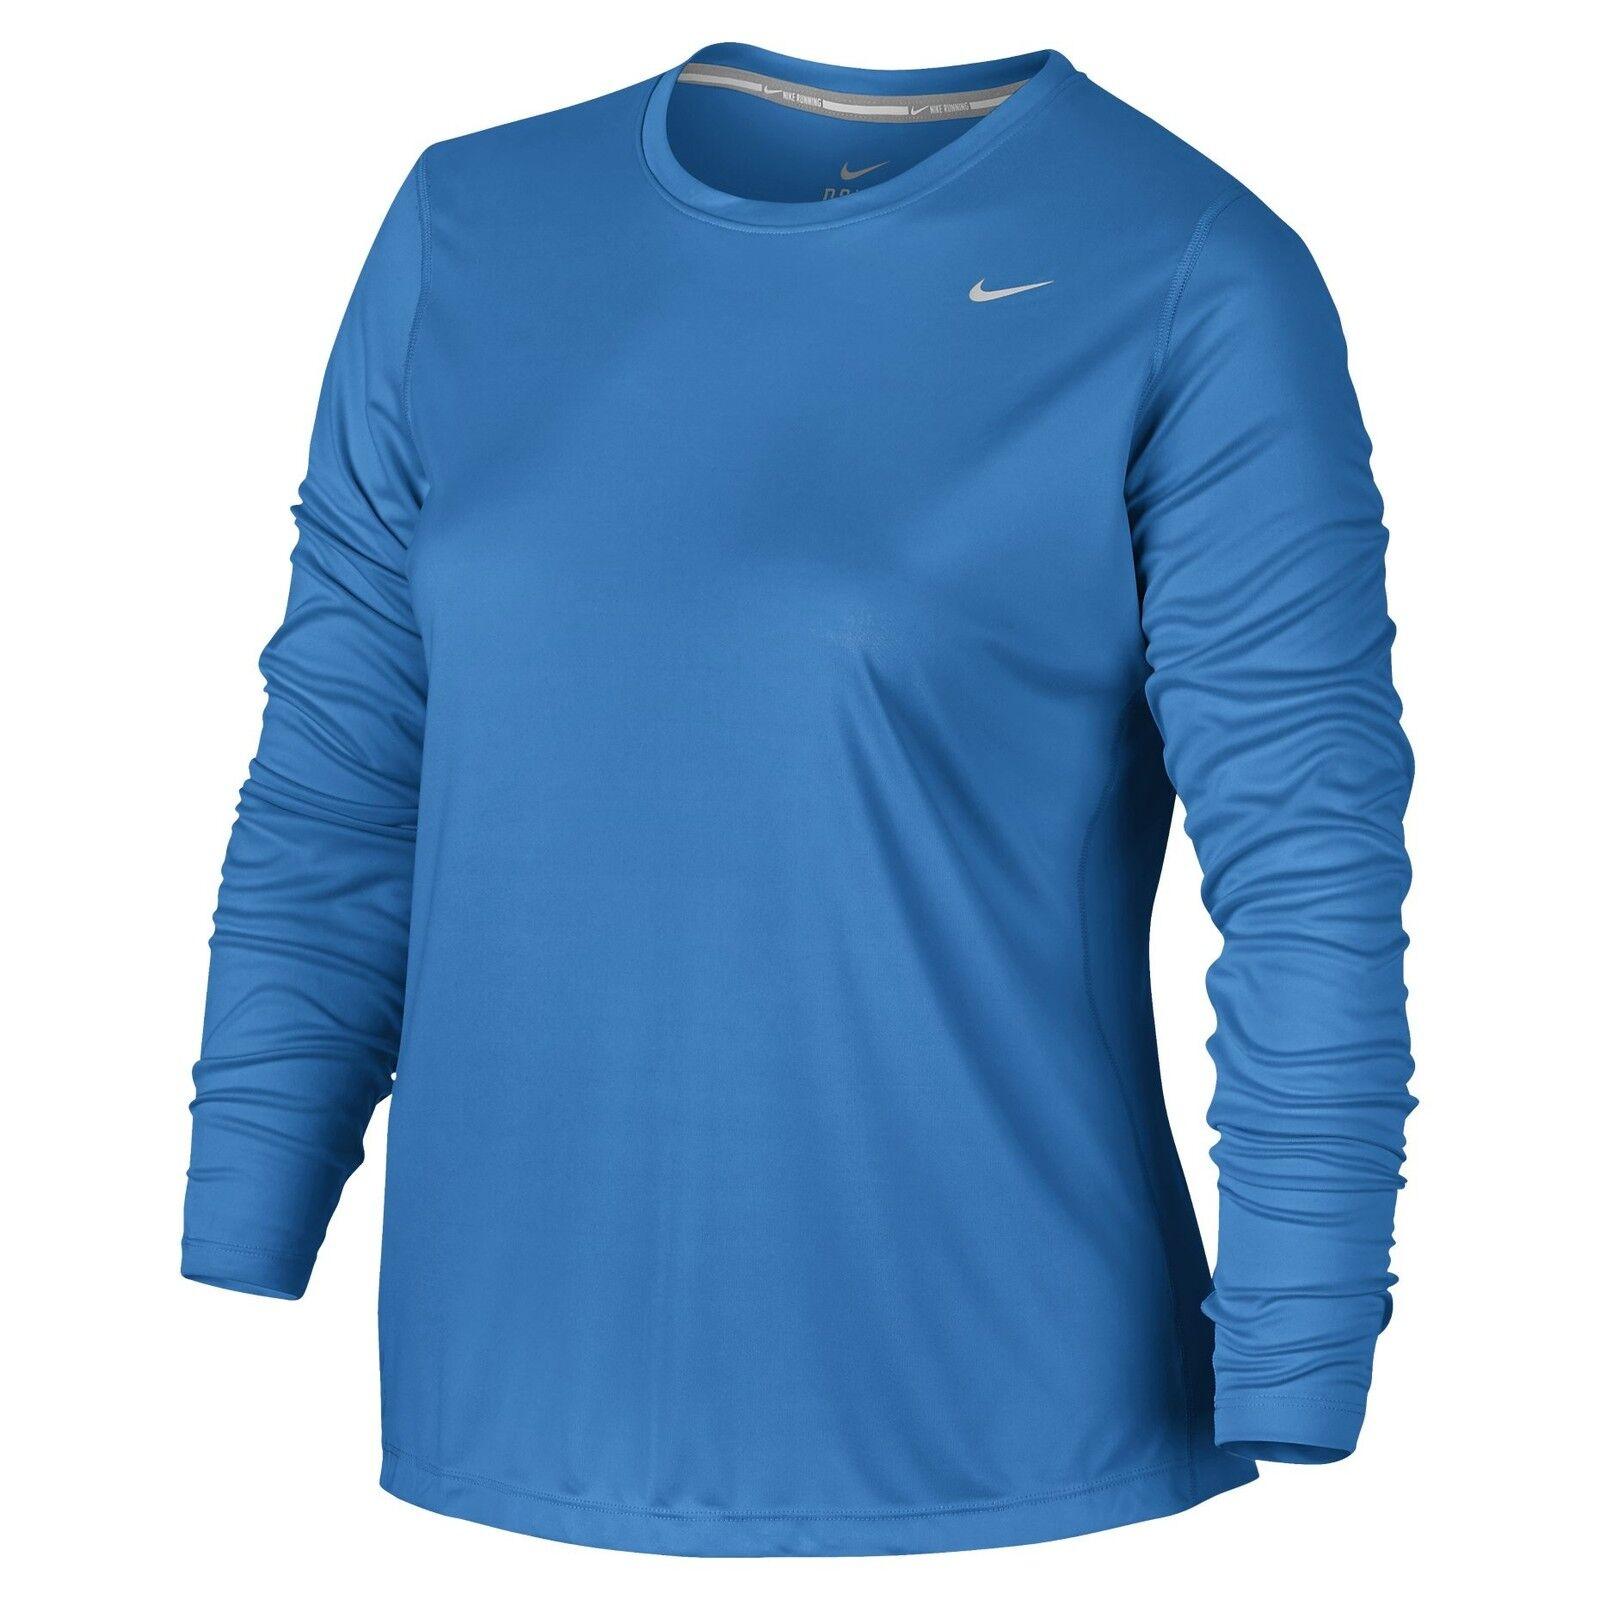 455fb099a03 Nike sz 1X Women's DRY MILER LONG SLEEVE Running Top Shirt NEW 747057 436  Blue